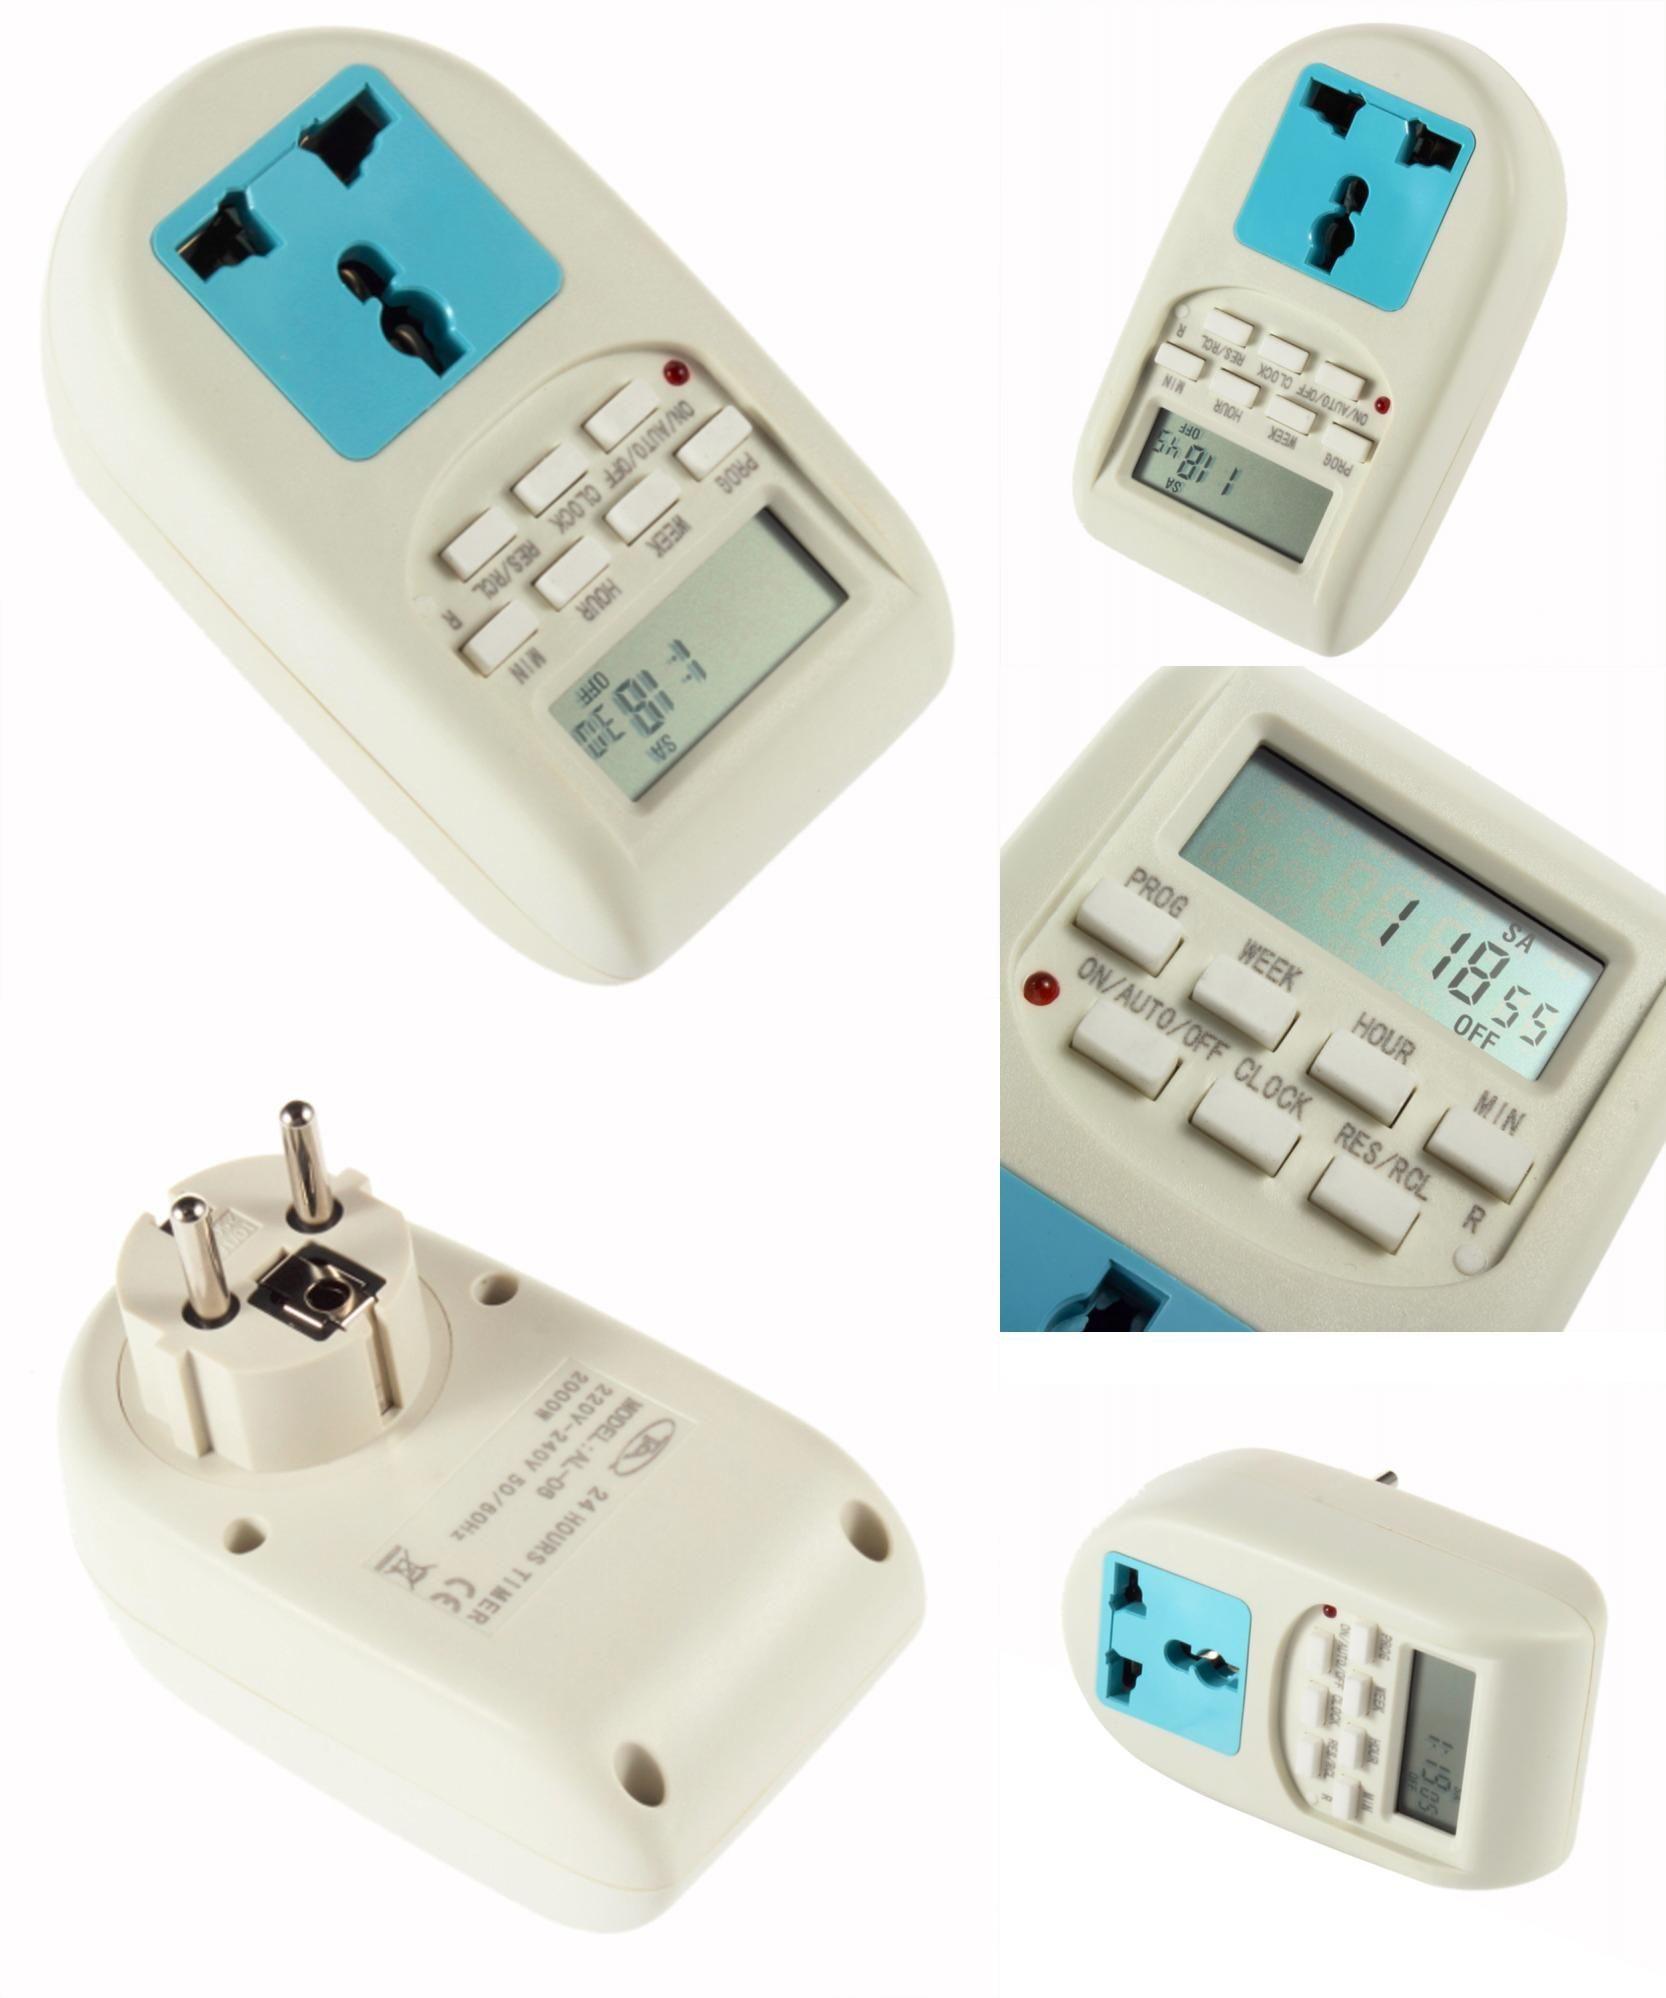 [Visit to Buy] Hot New Digital Timer EU Plug Energy Saving Timer Programmable Electronic Timer Socket Hot Selling Wholesale Hot Promotion #Advertisement